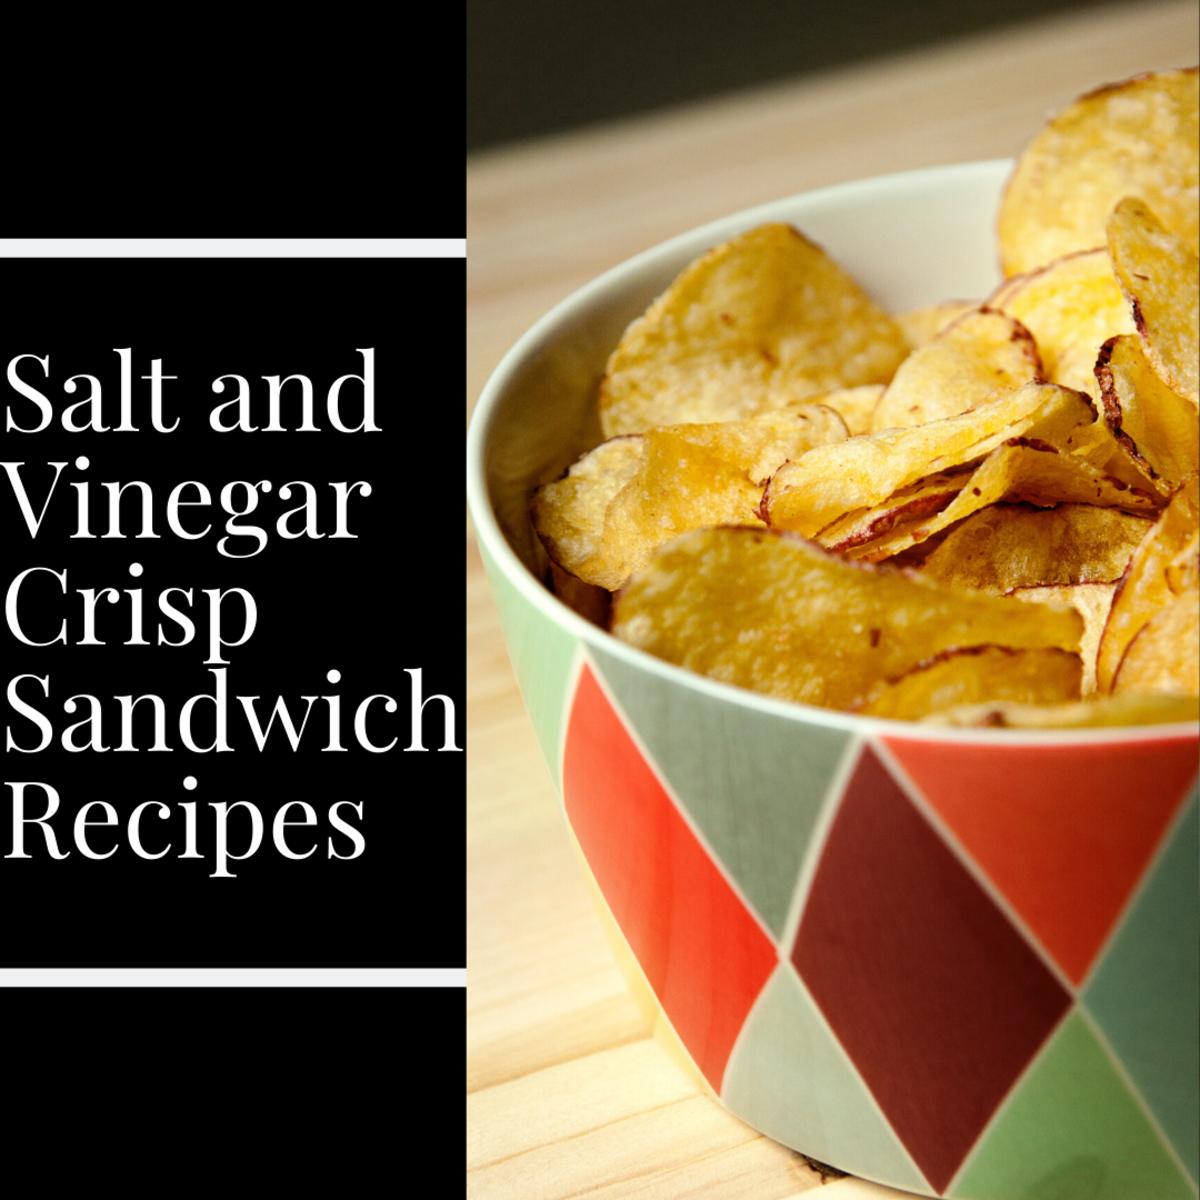 10 Salt and Vinegar Crisp Sandwich Recipes